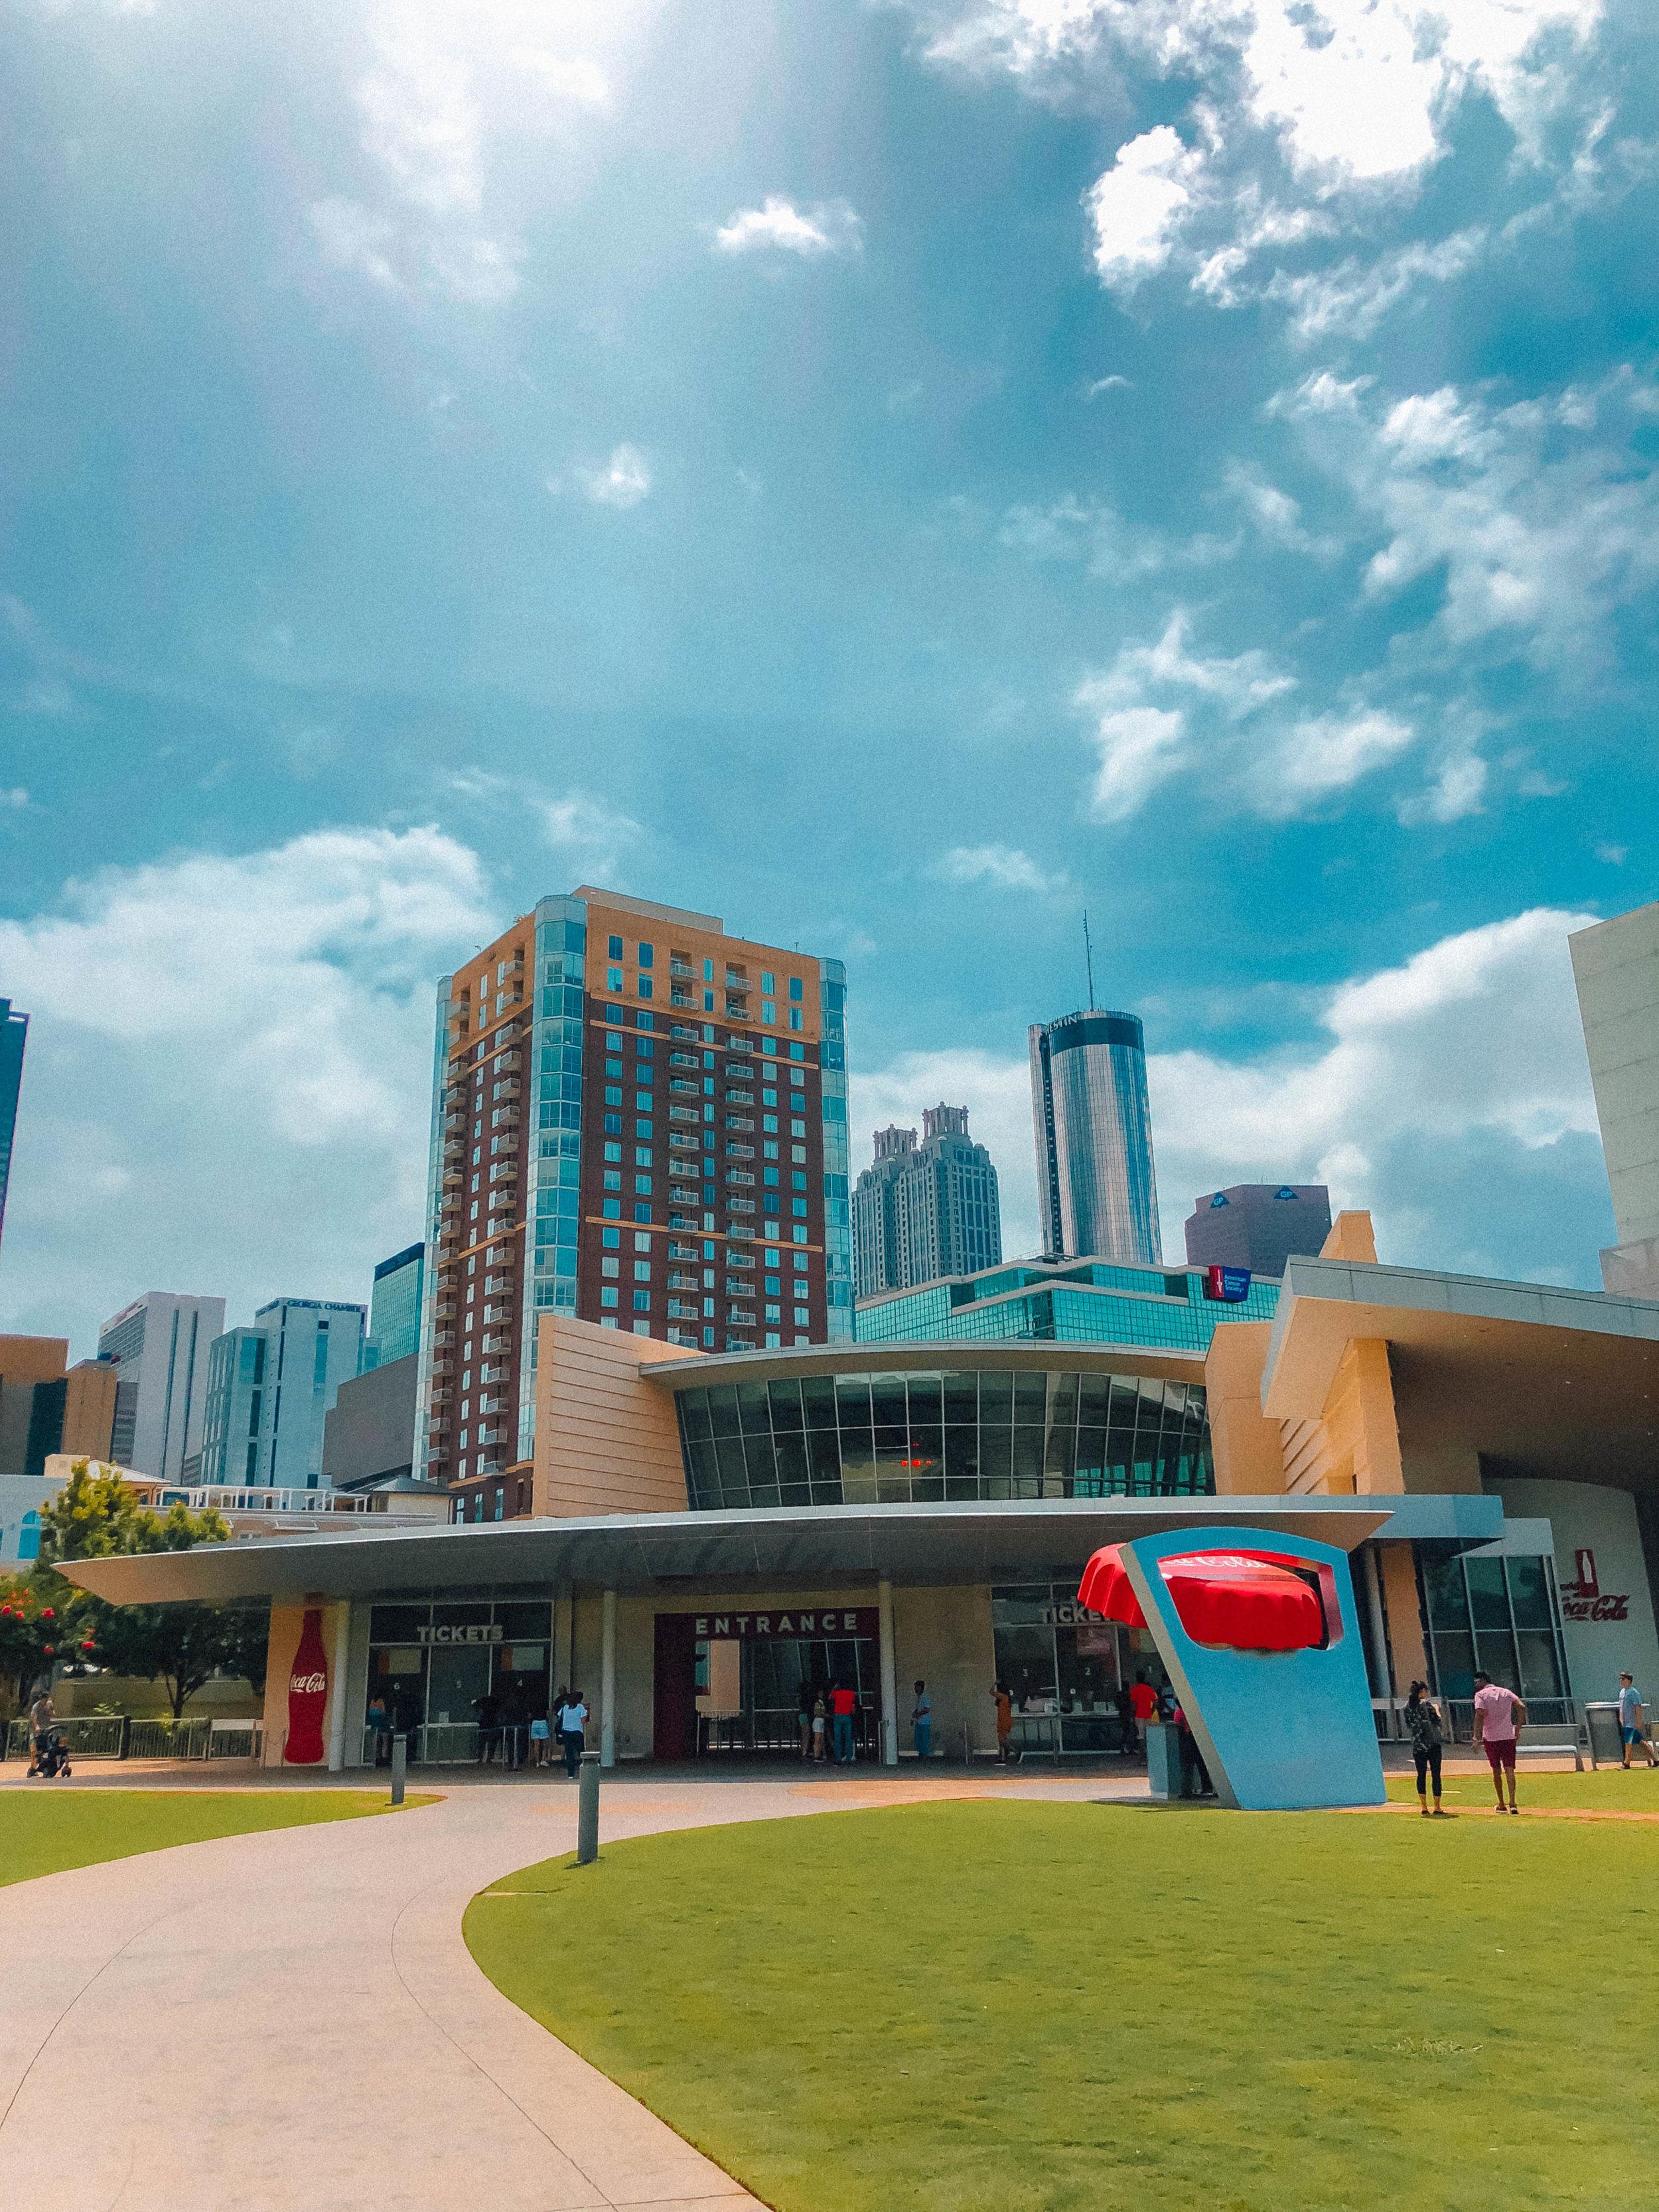 World of Coca-Cola | Things to Do in Atlanta | Jordan Hefler